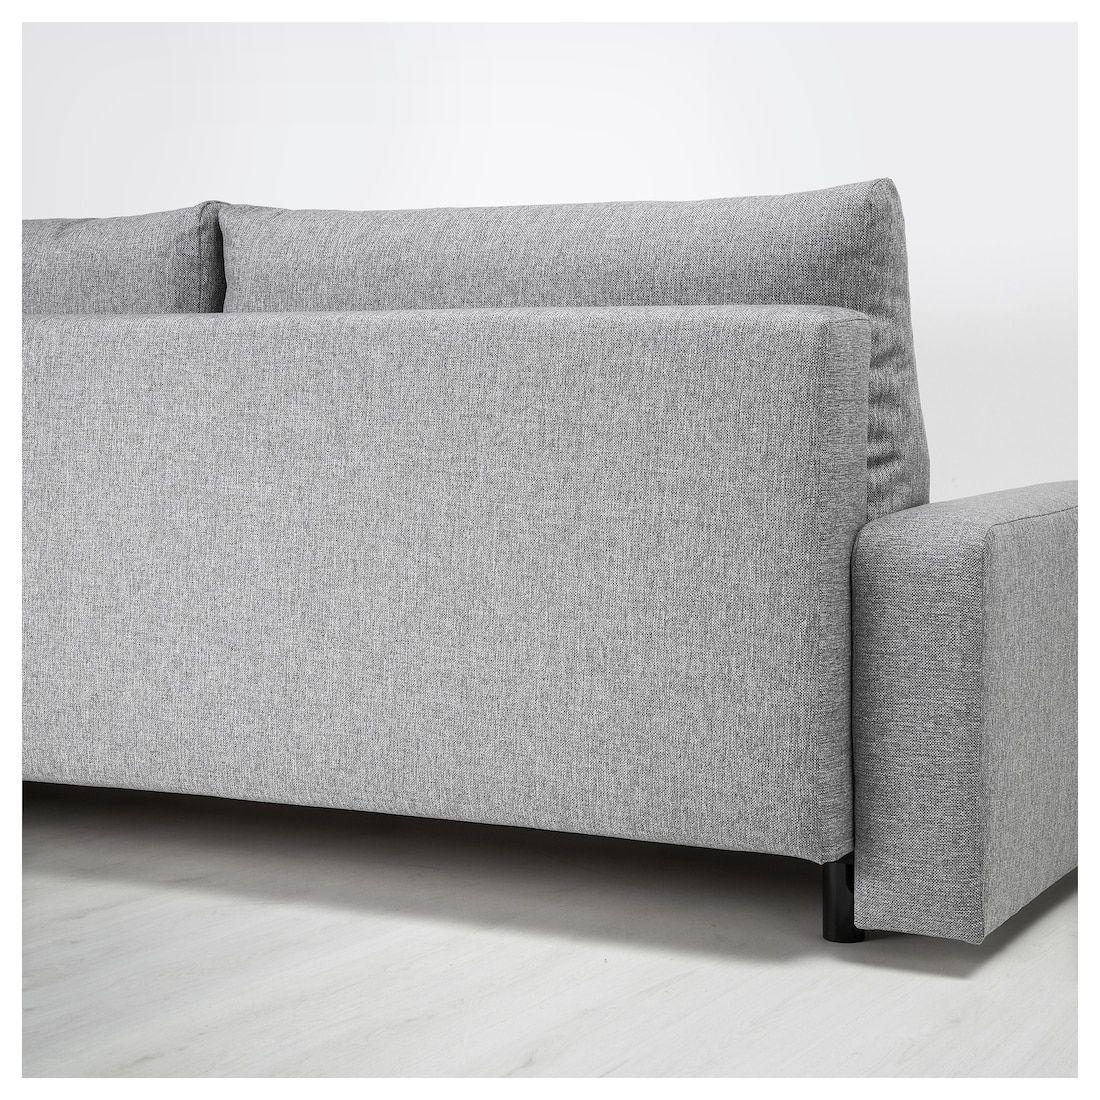 Gralviken Rozkladana Sofa 3 Osobowa Szary With Images Ikea